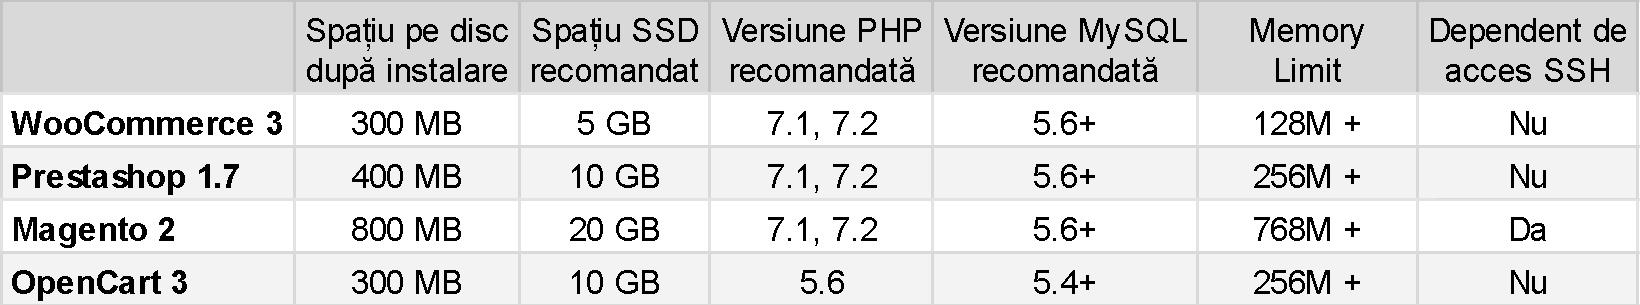 tabel-CMS-ecommerce